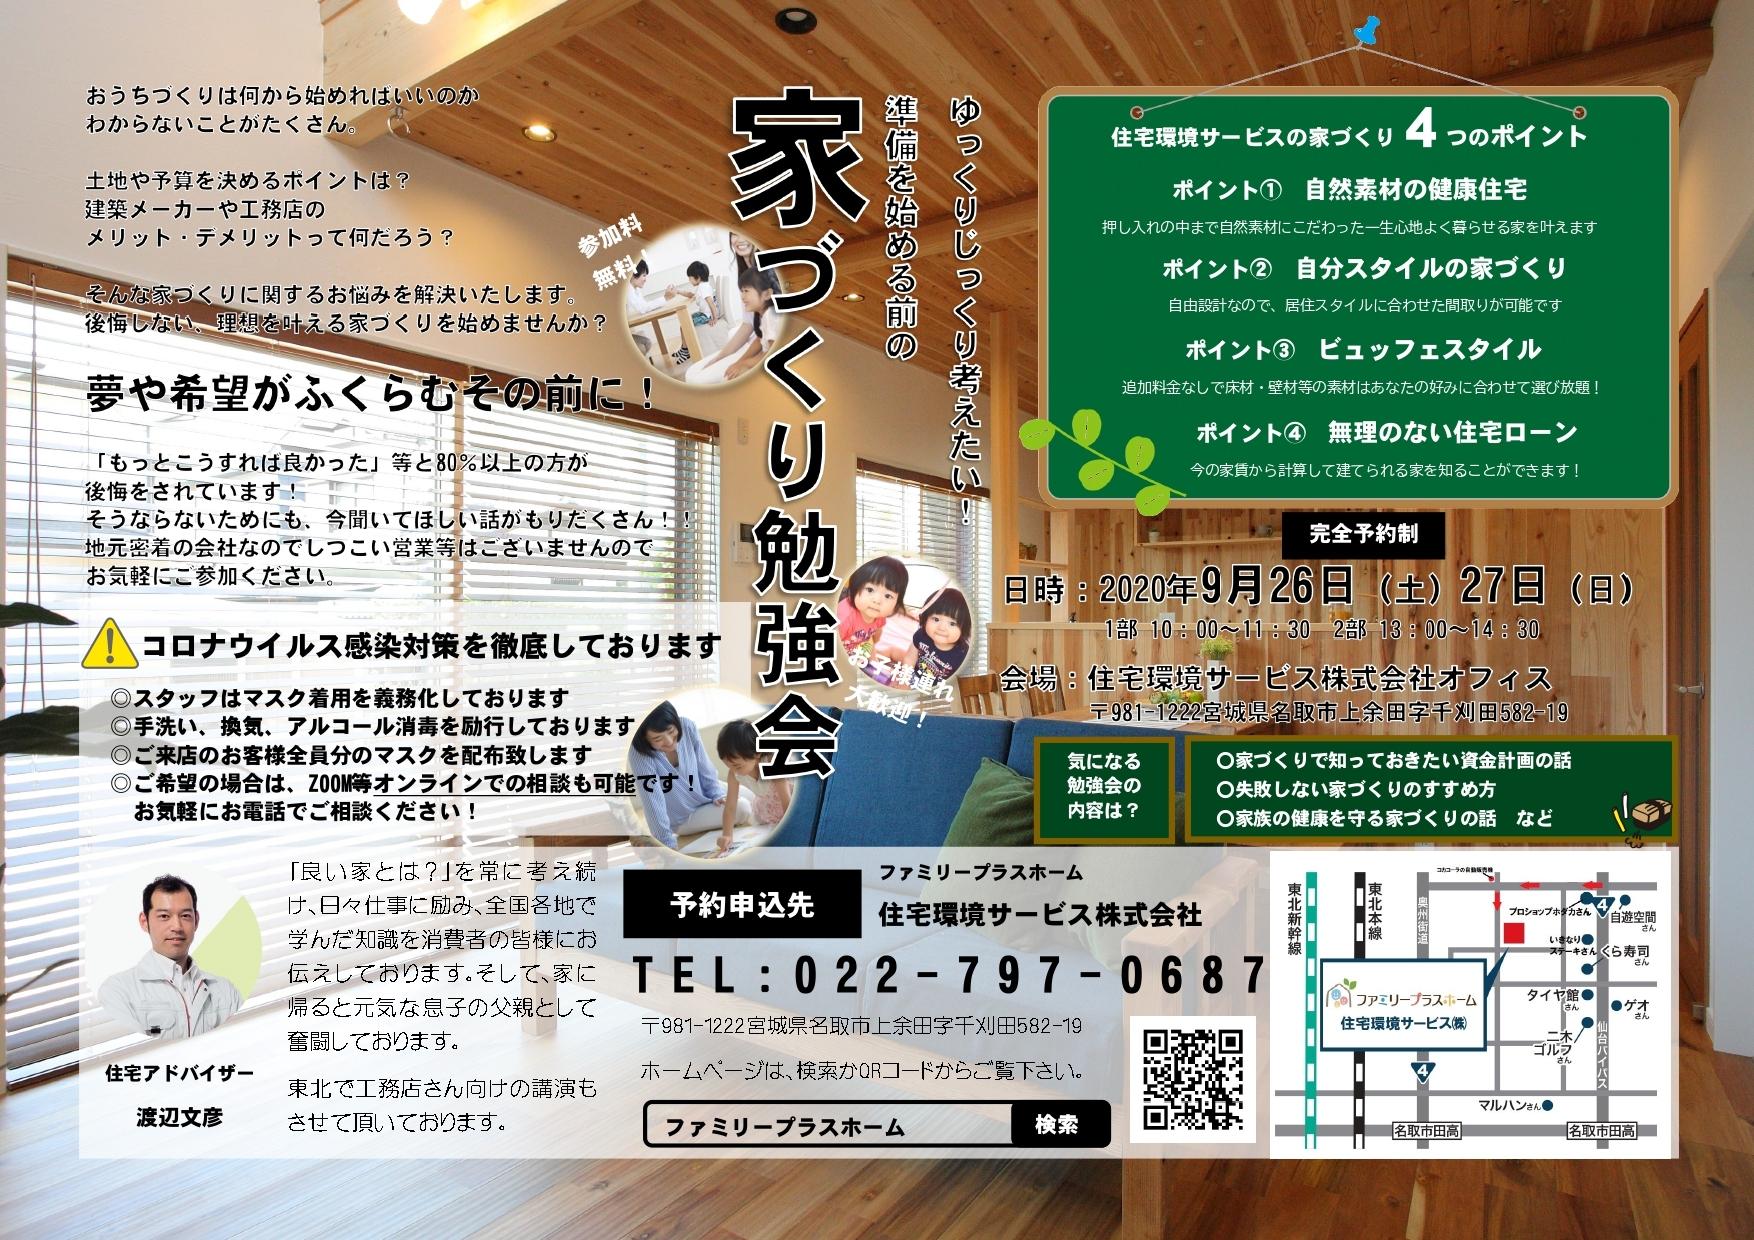 http://www.jutakukankyo-service.jp/3501df4daf6575a2adbcbf6856948eafcaefb791.jpg